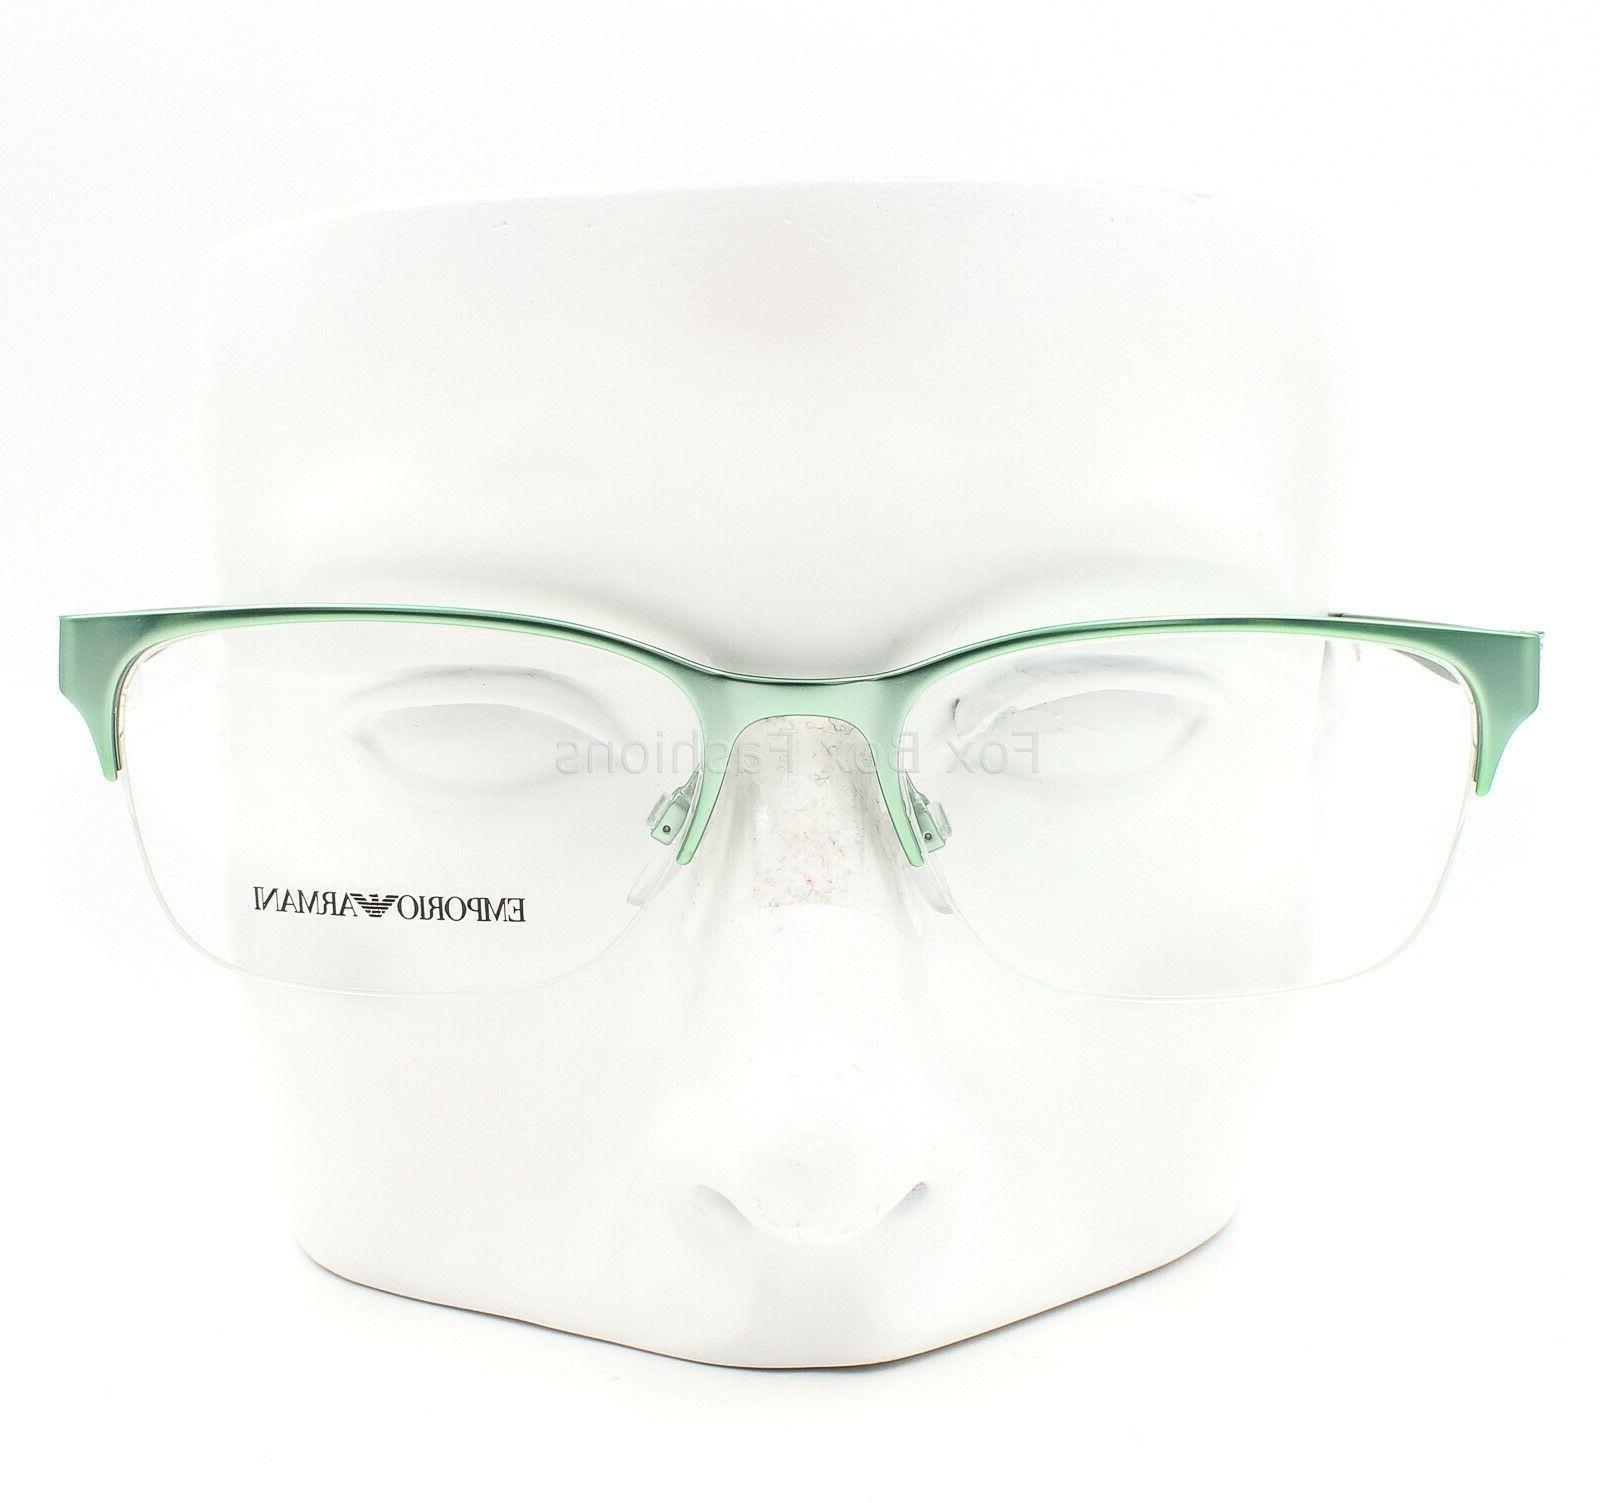 Emporio EA 3075 Semi Rimless Eyeglasses Glasses